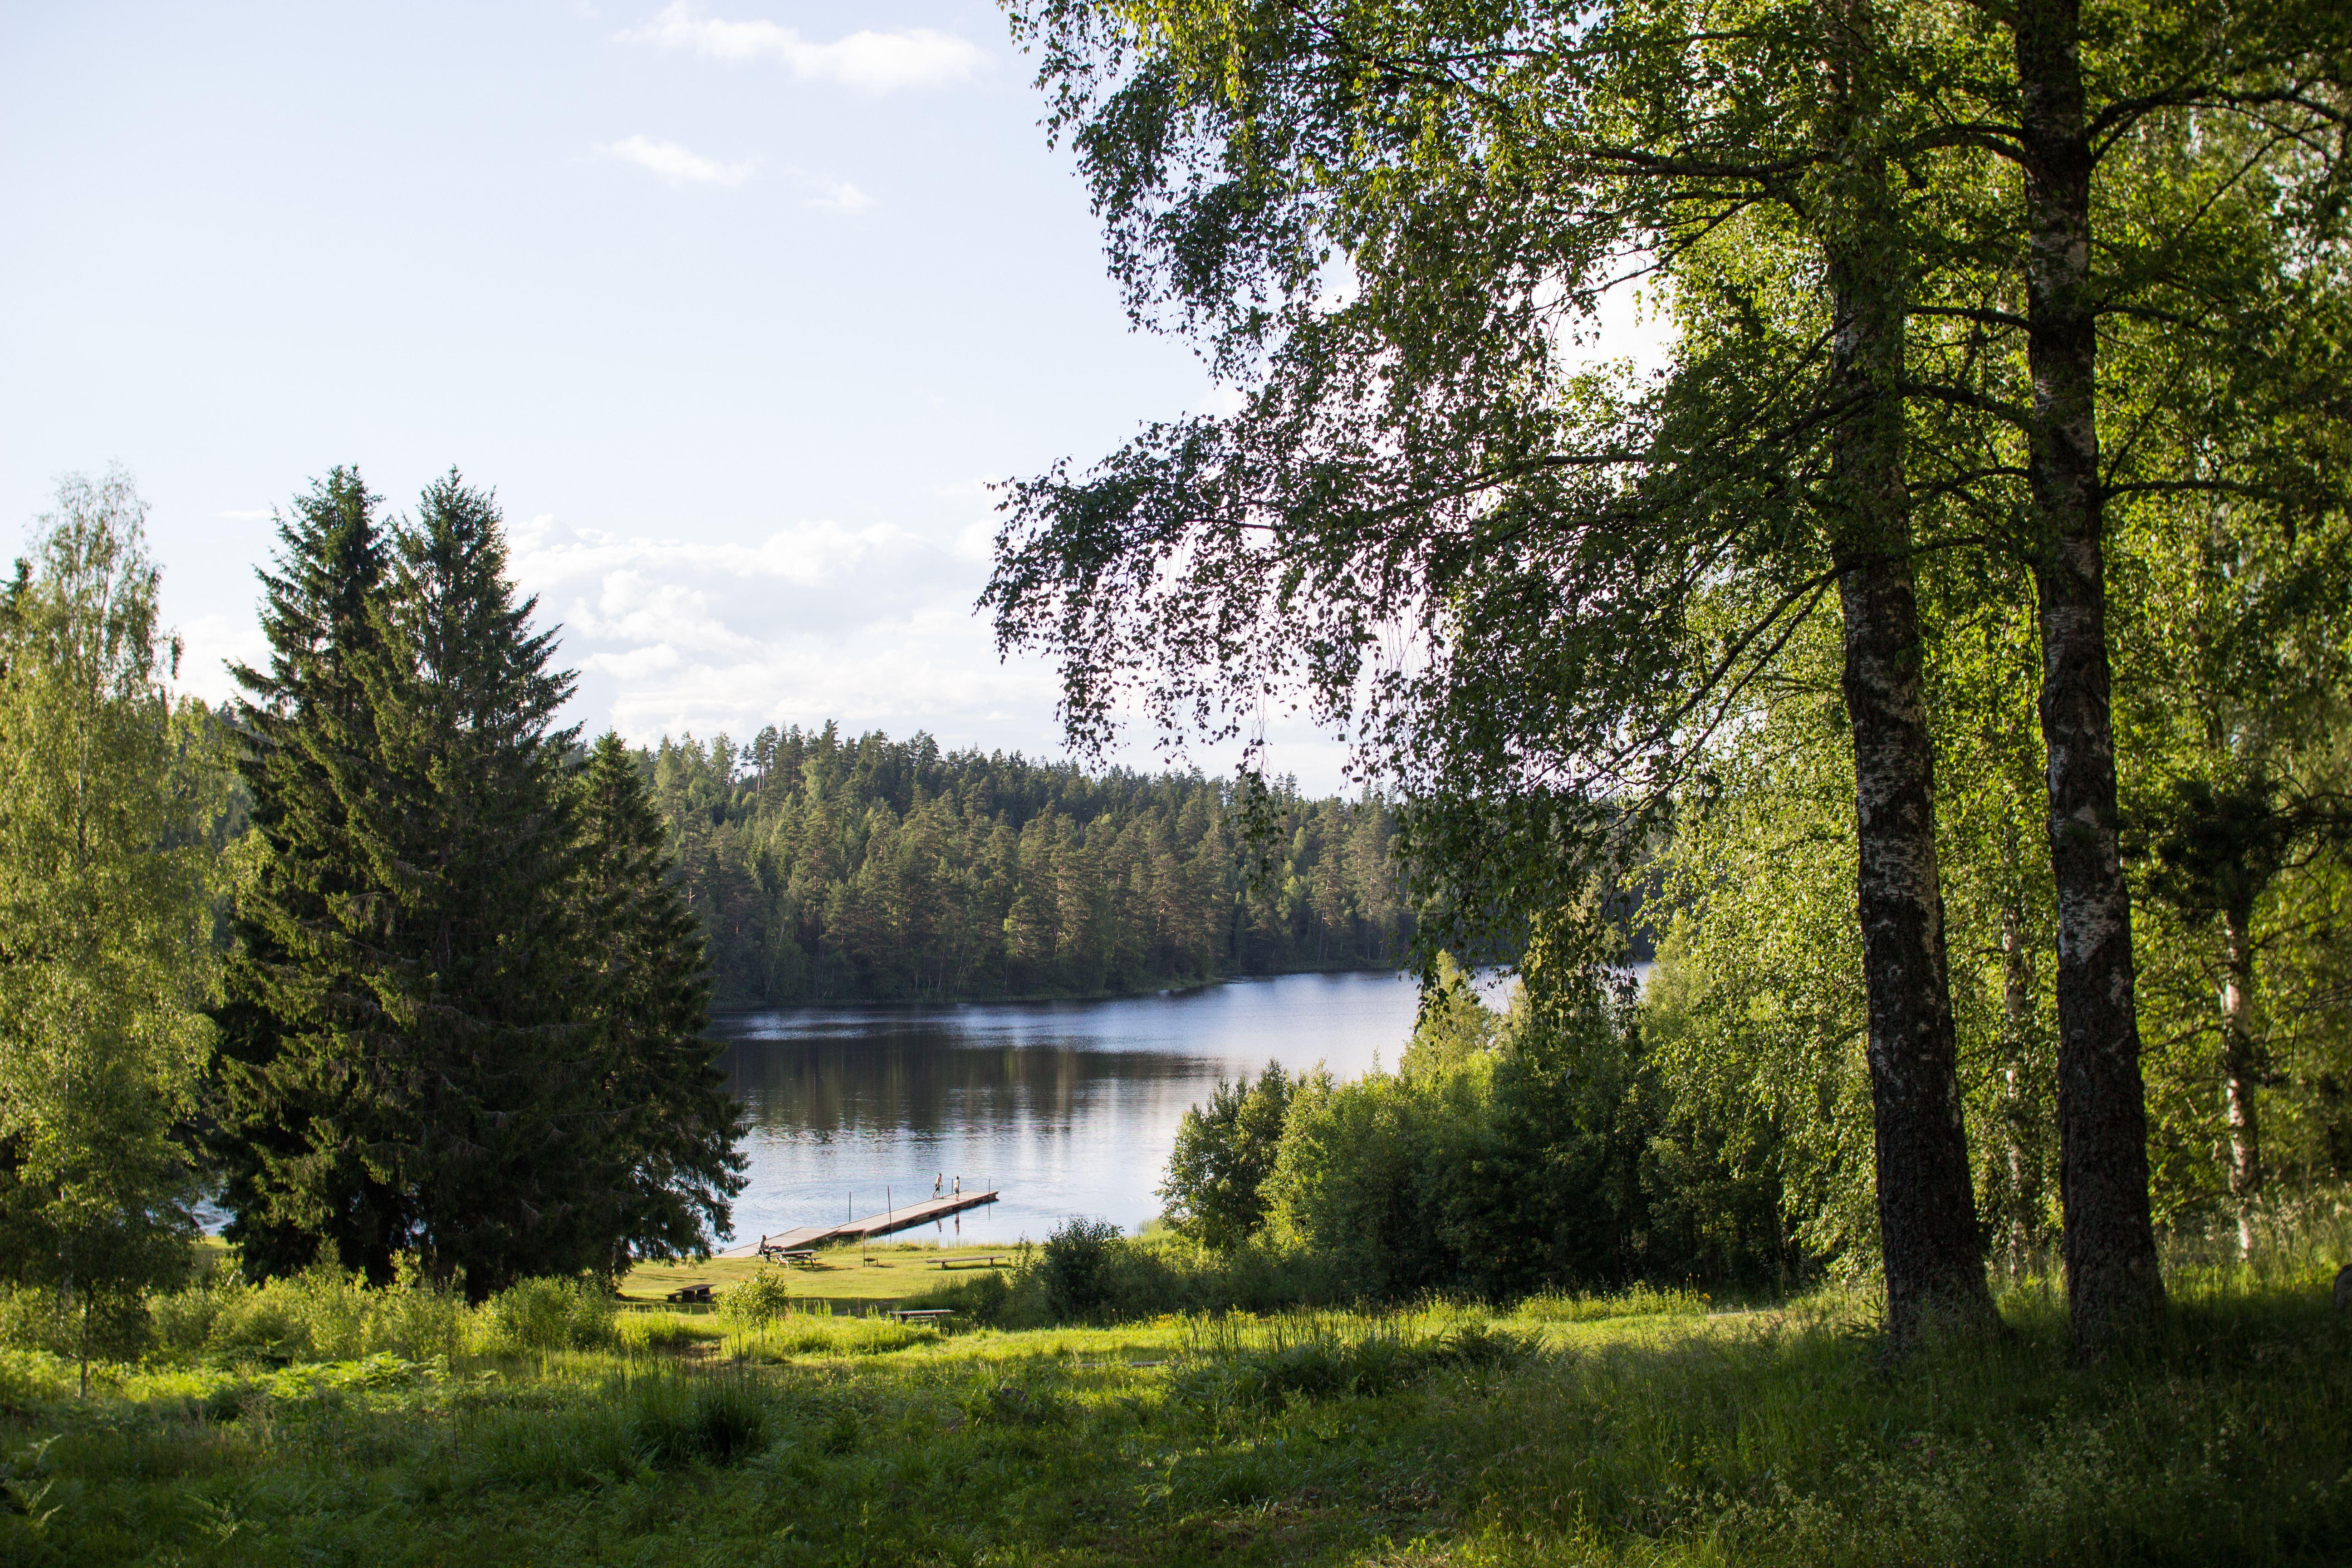 Sörsjöns Camping & Stugby / Stugby